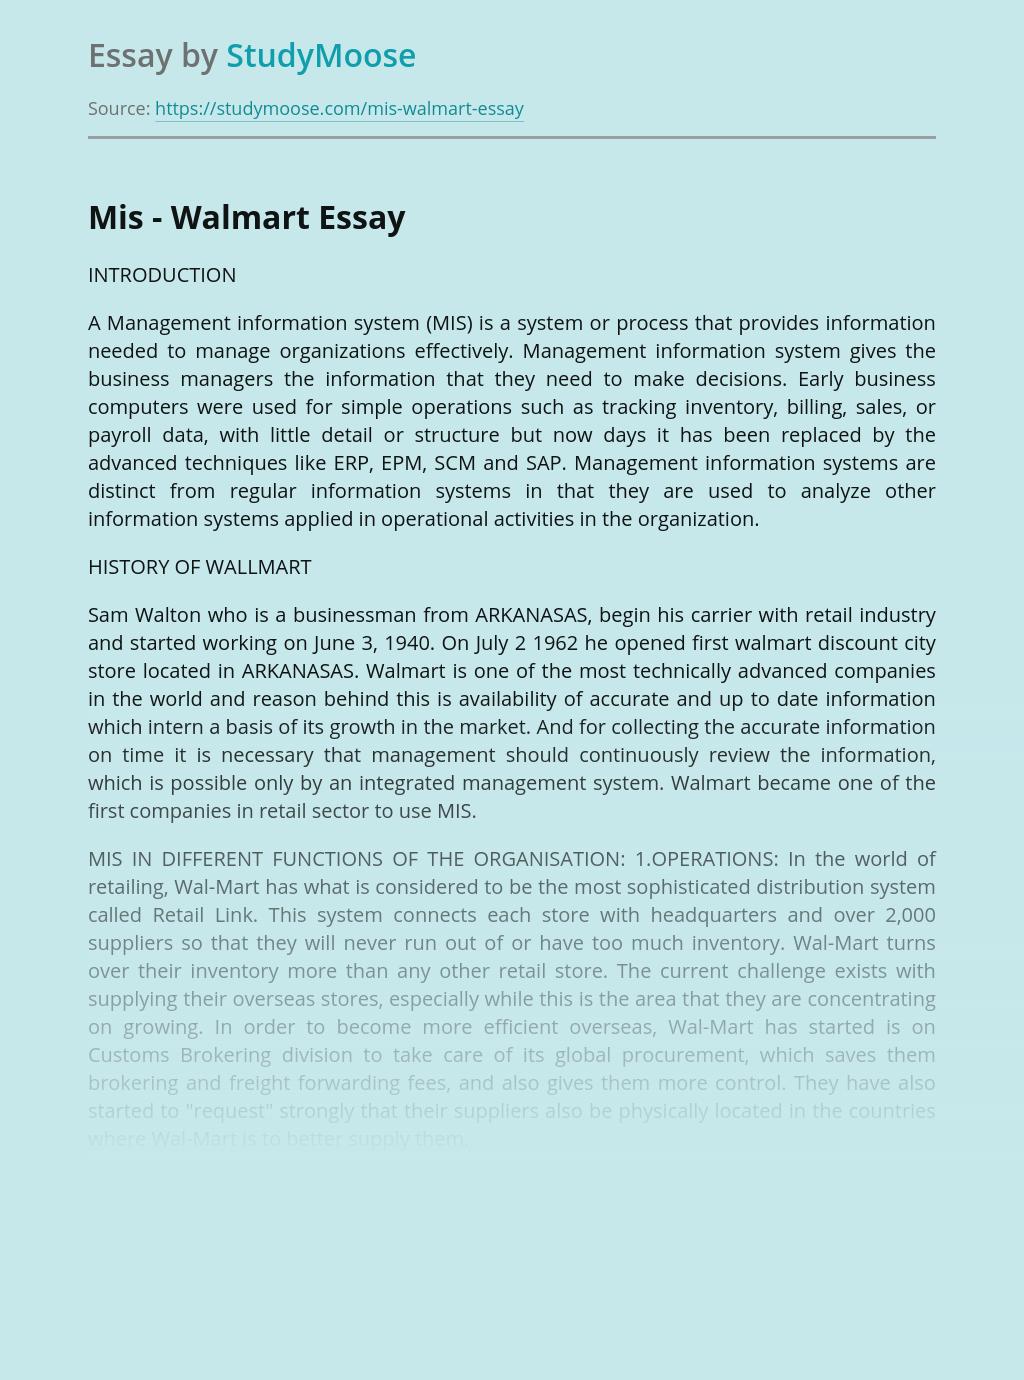 A Management information system - MIS - Walmart